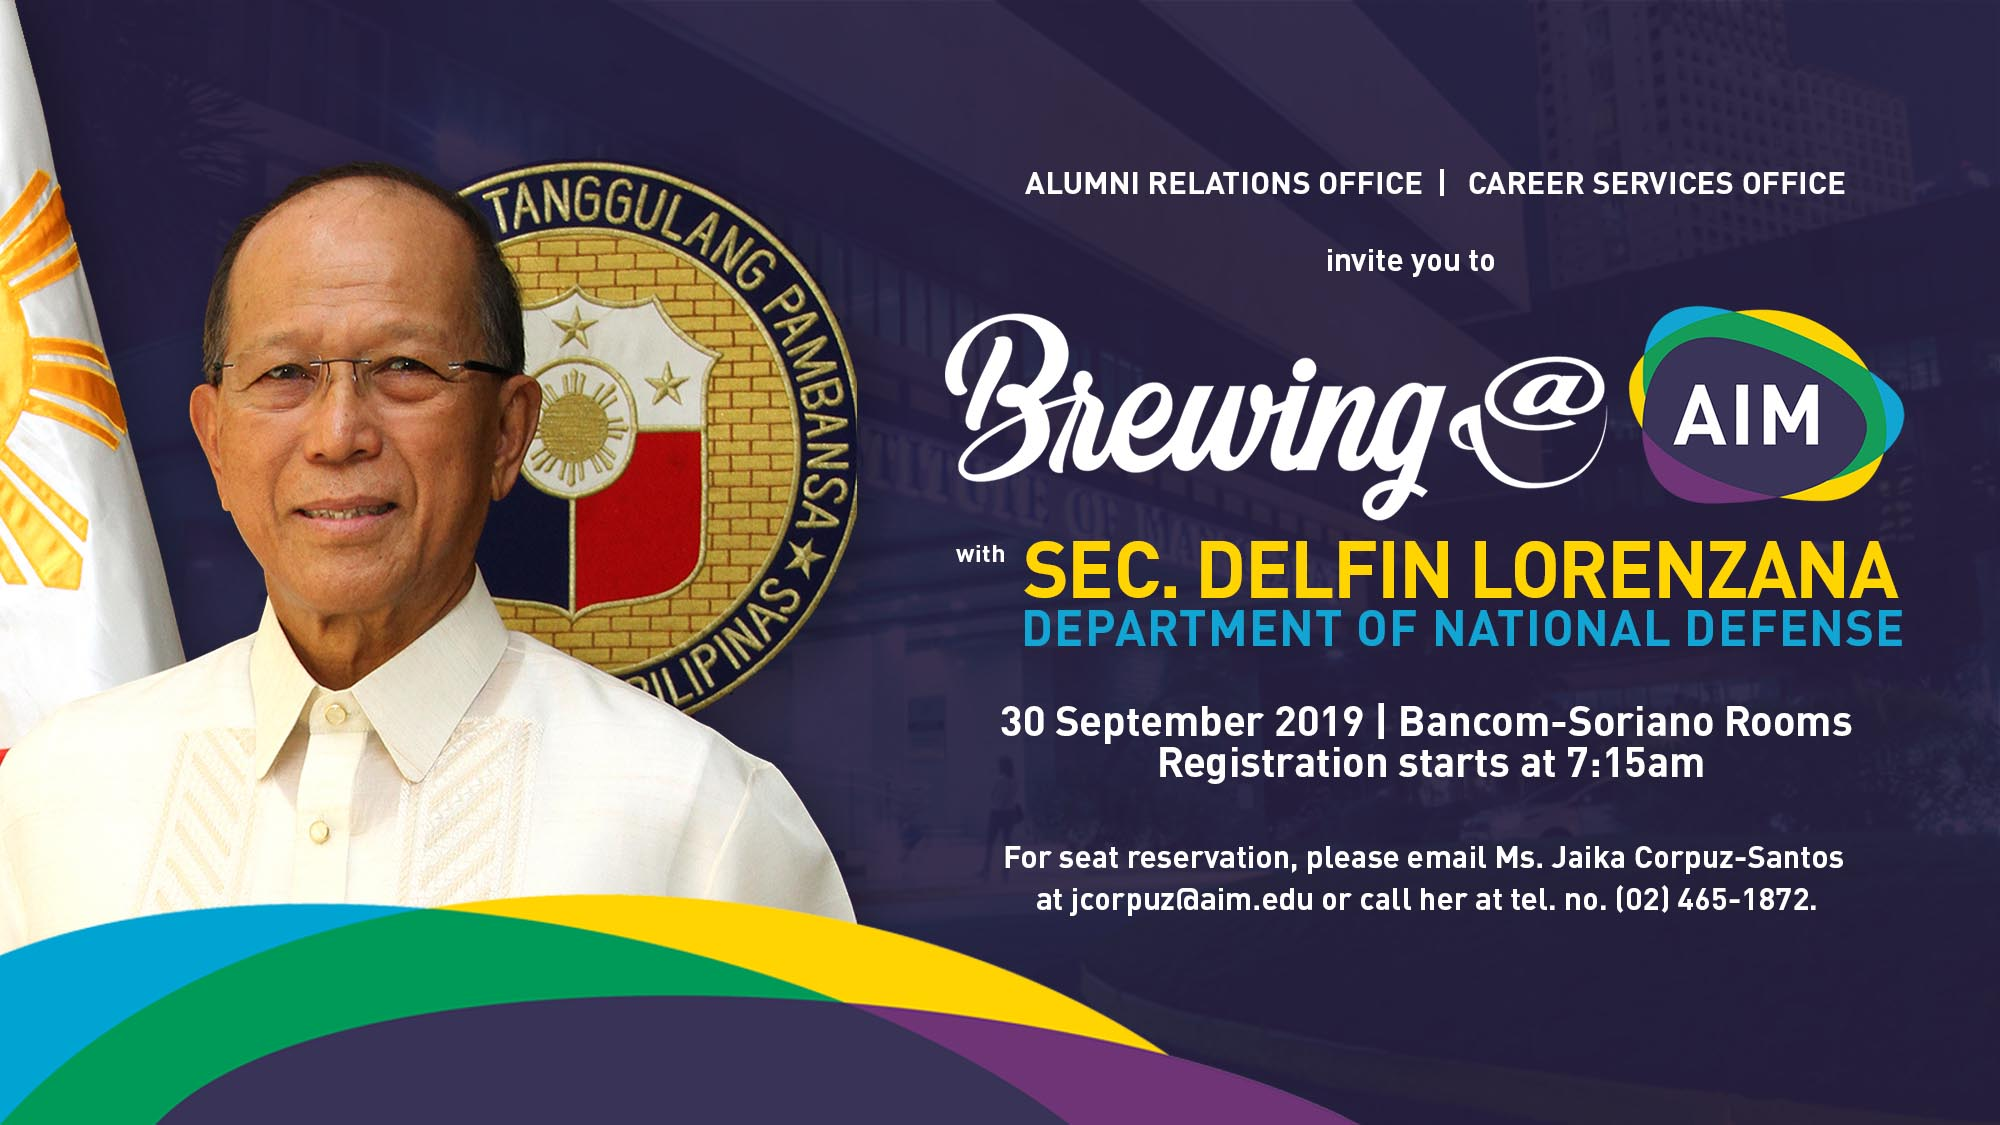 Brewing@AIM with Sec. Delfin Lorenzana, Department of National Defense